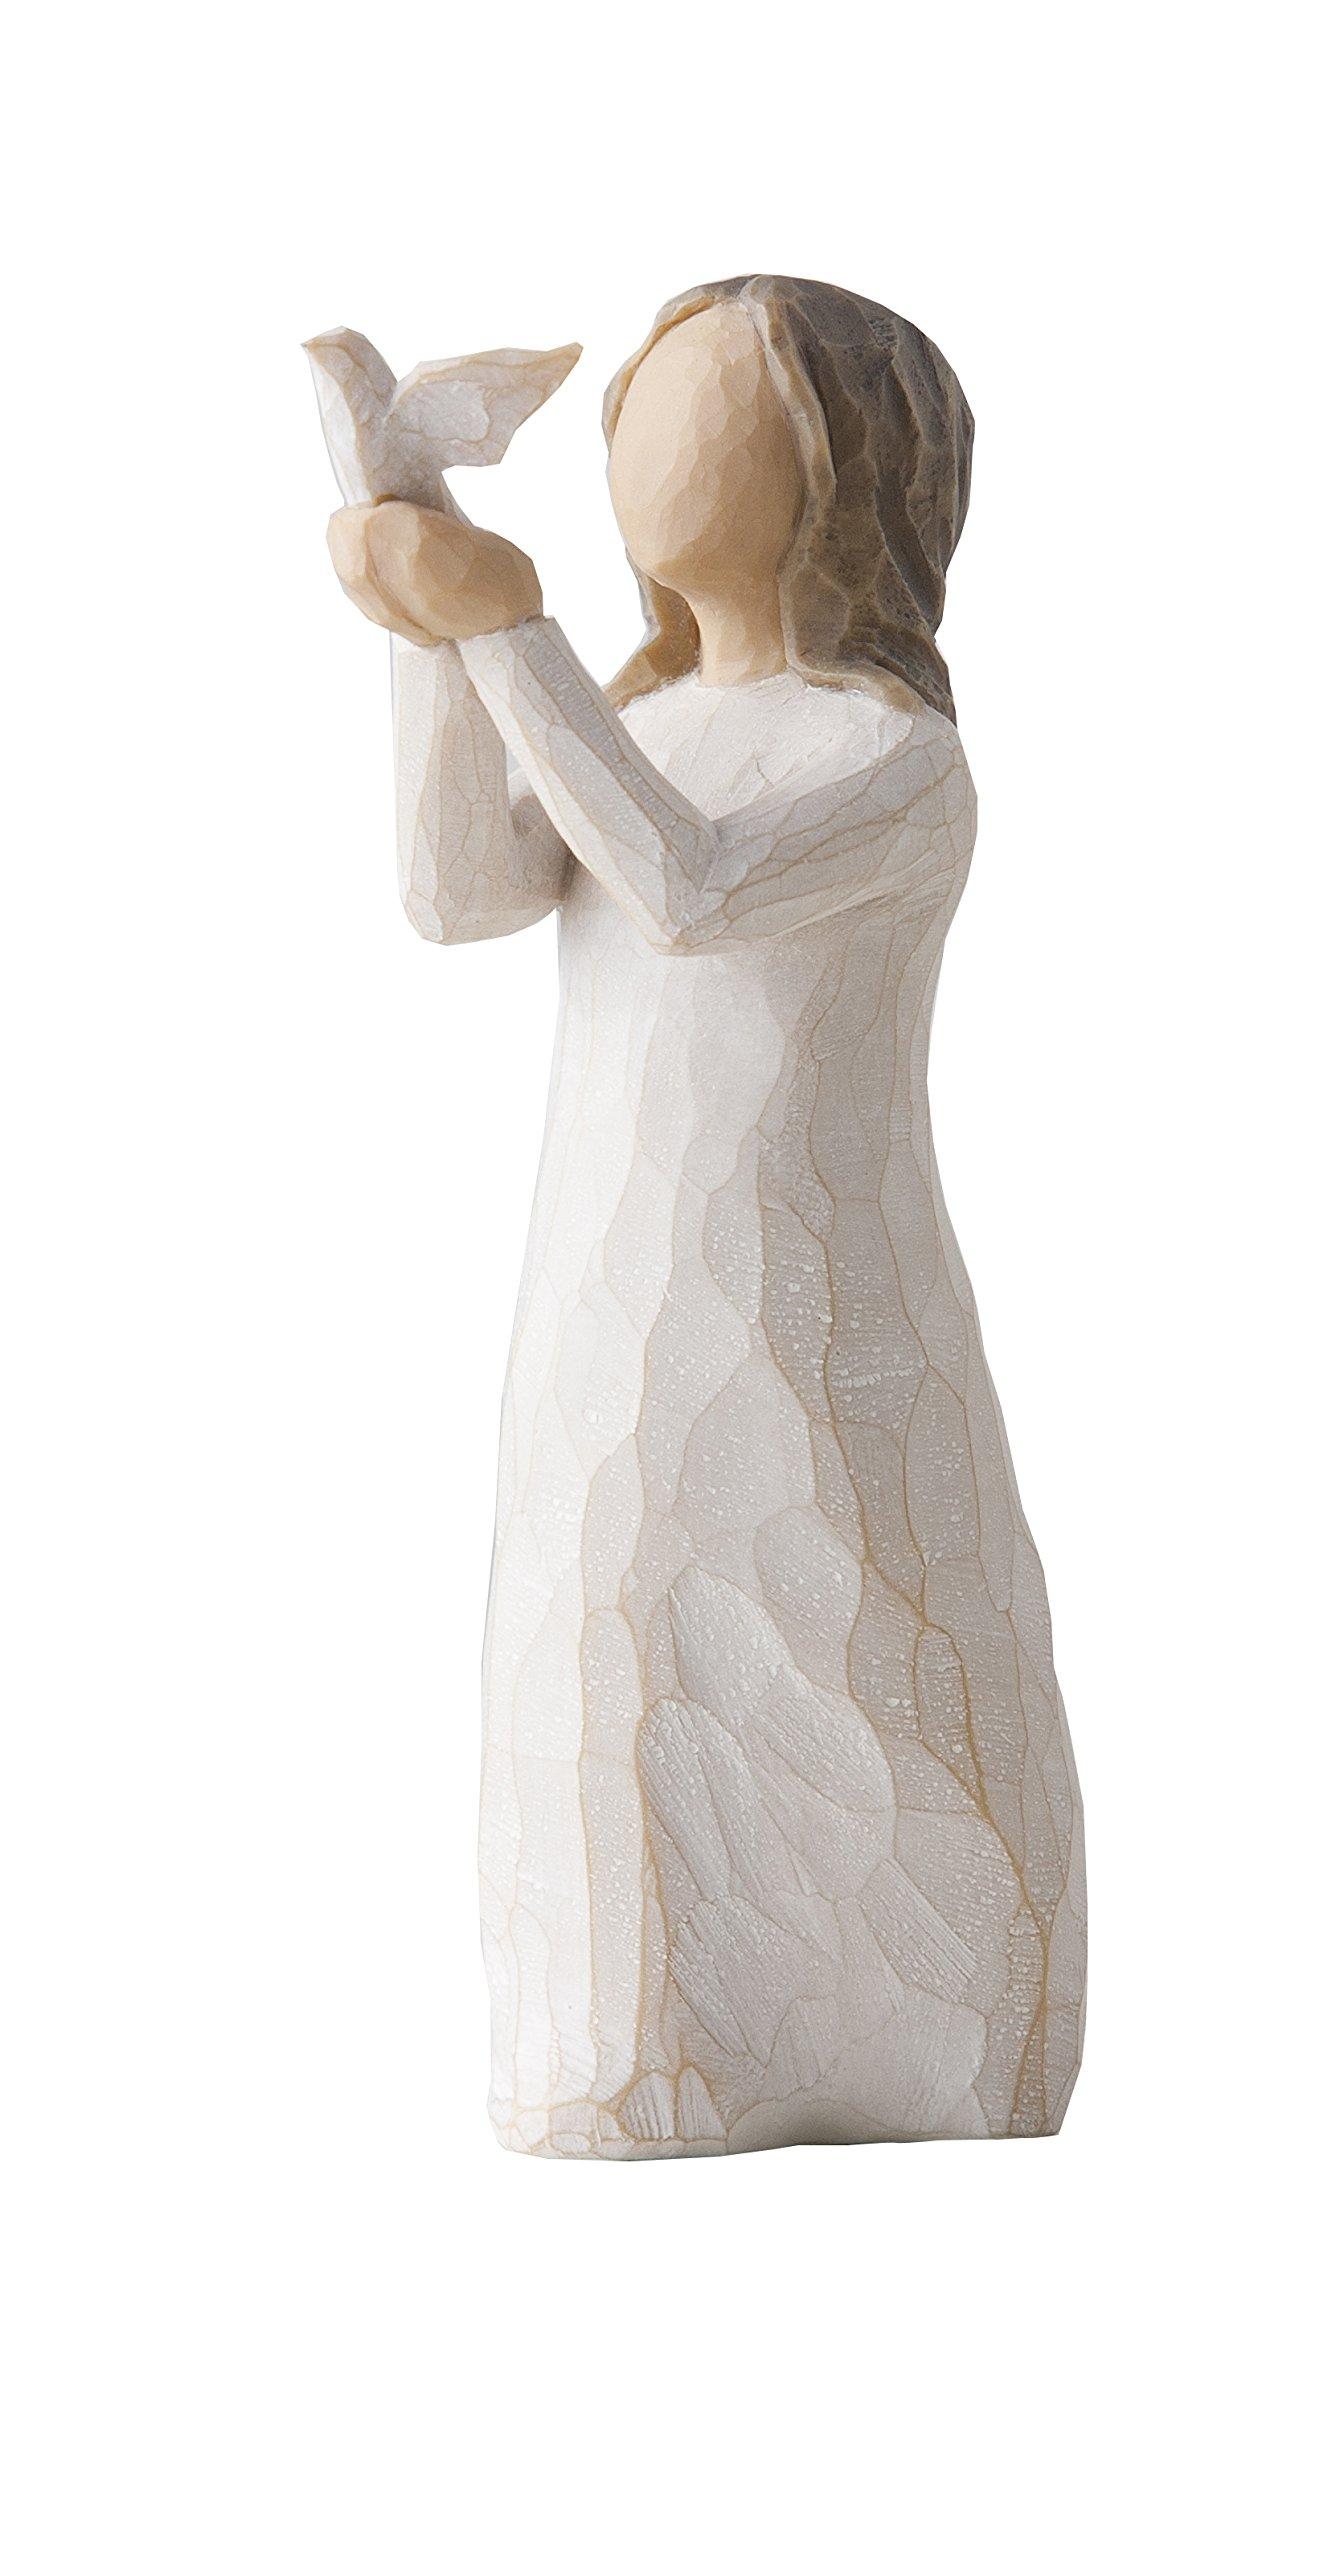 willow tree soar figurine new ebay. Black Bedroom Furniture Sets. Home Design Ideas